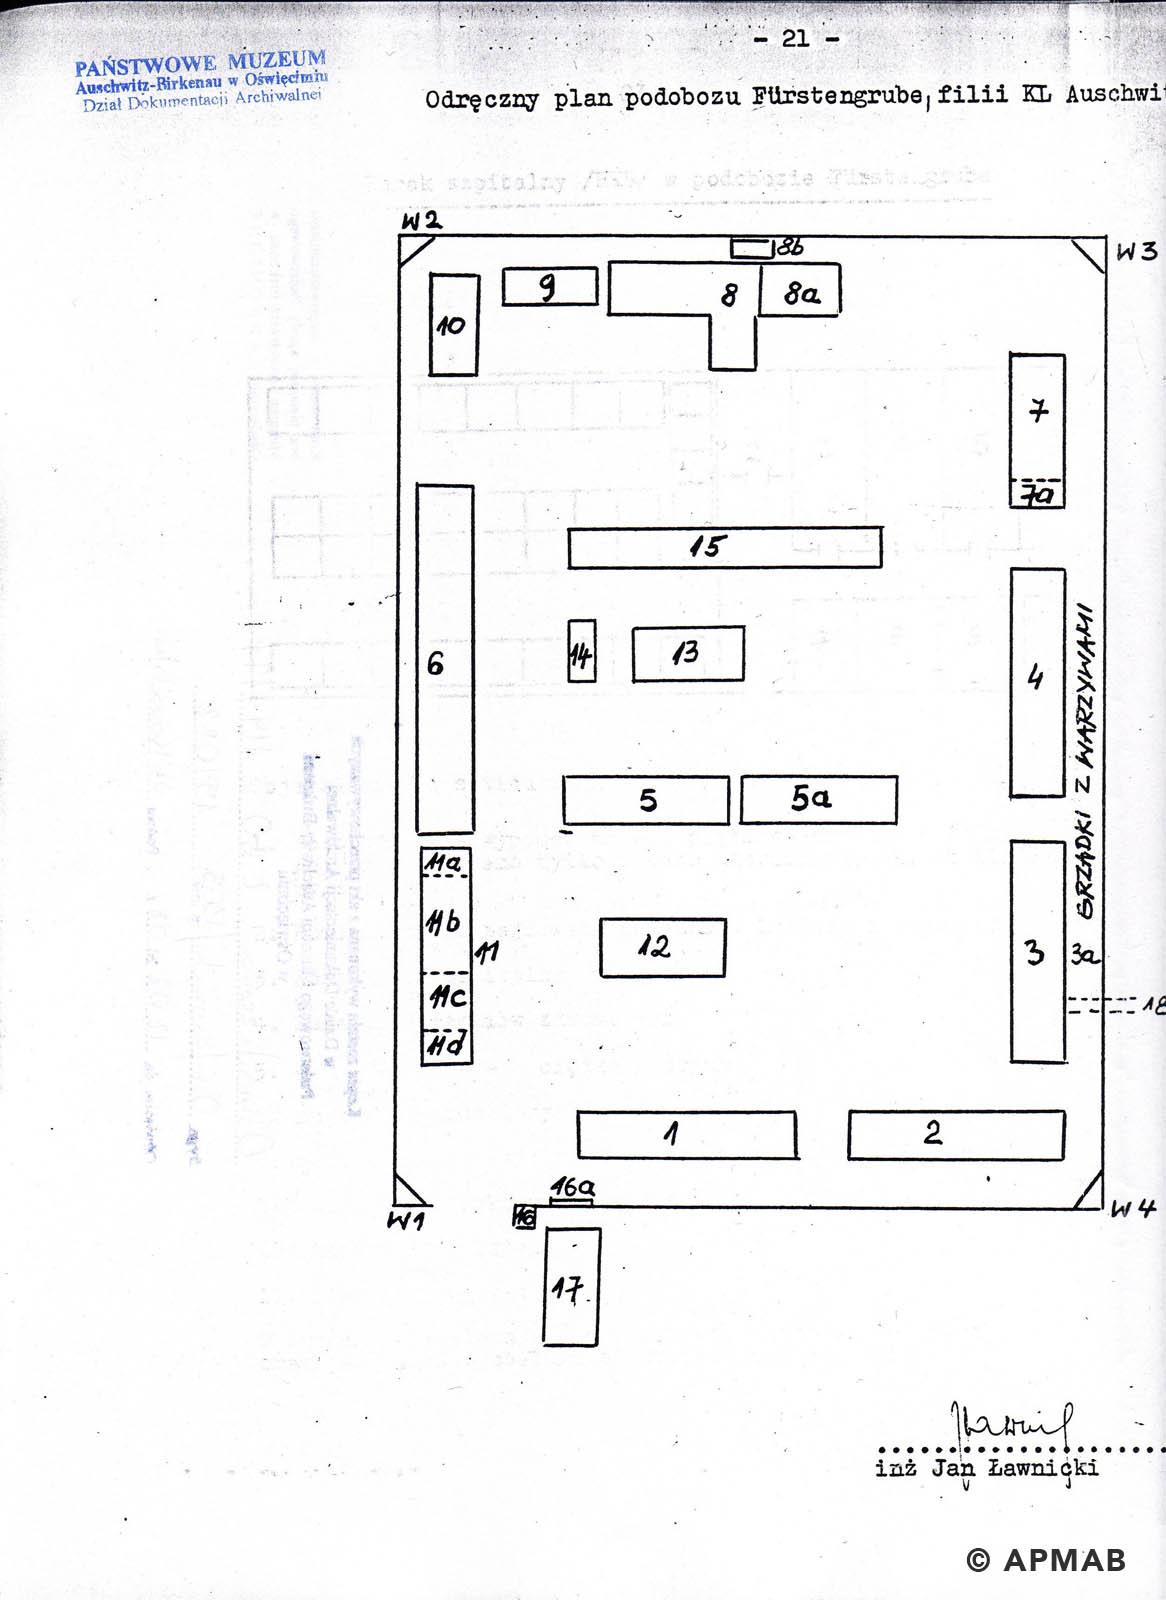 Former prisoner drawing of Fürstengrube sub camp. A. APMAB